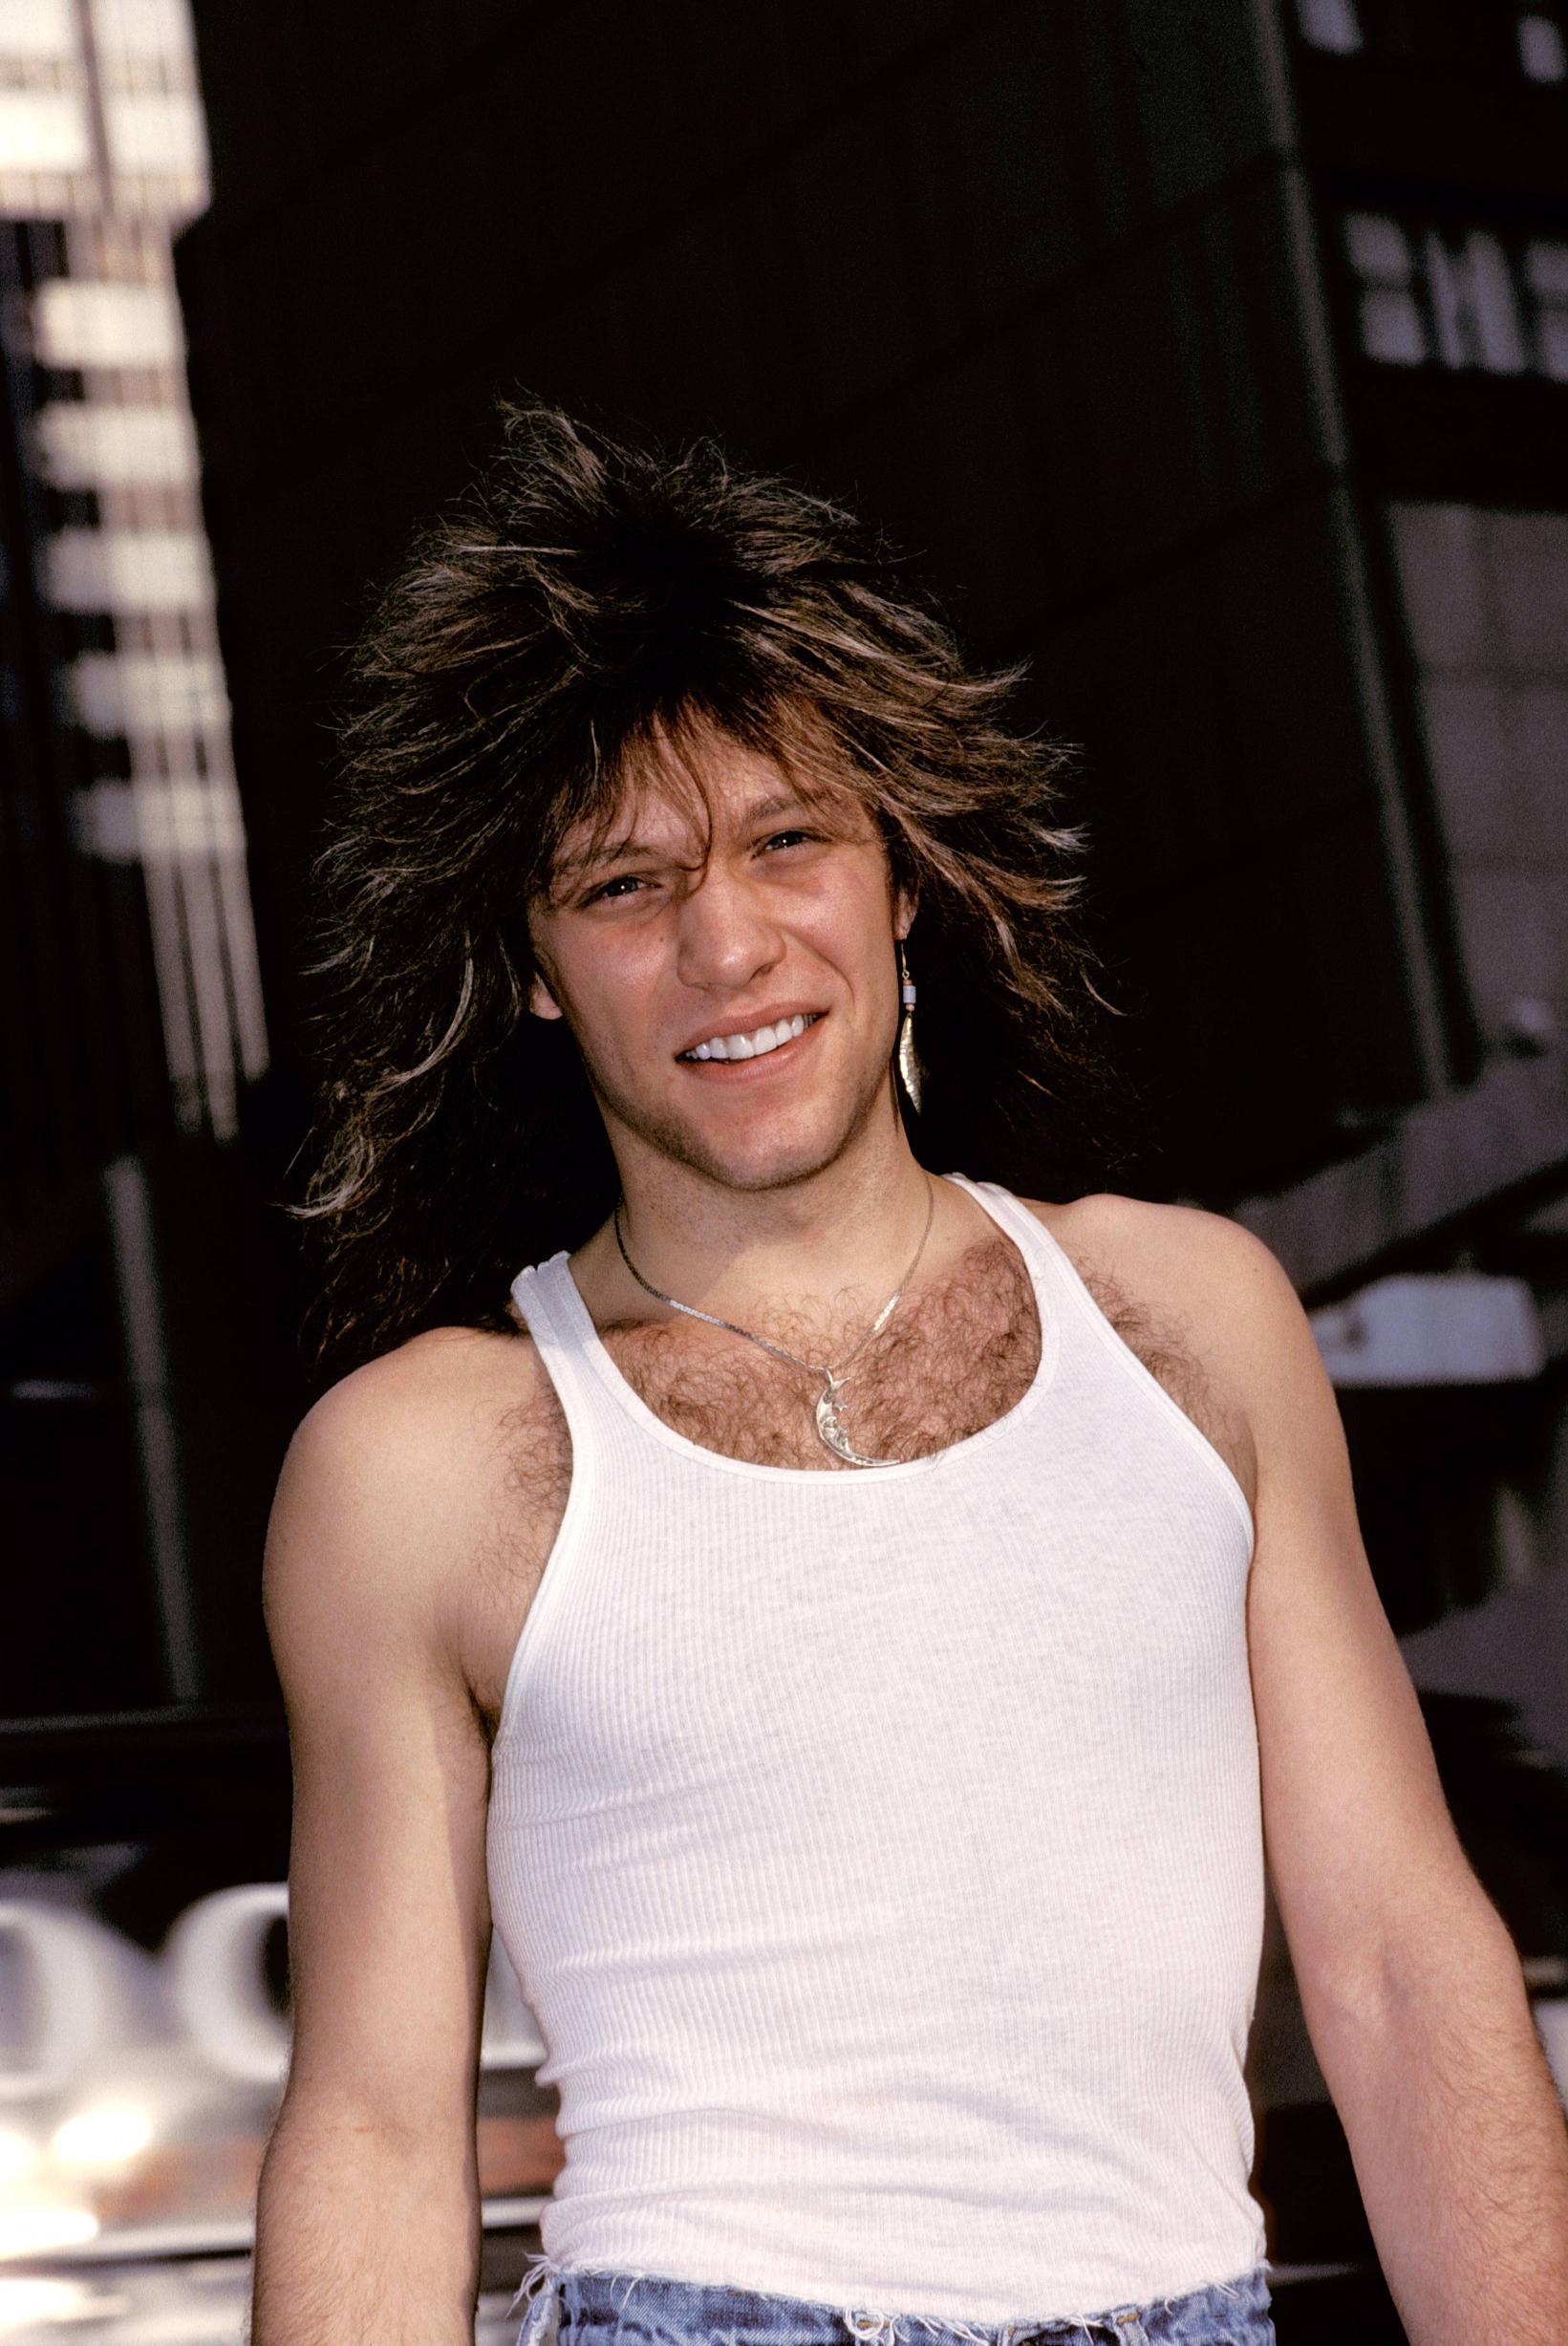 John Bon Jovi photo ga...